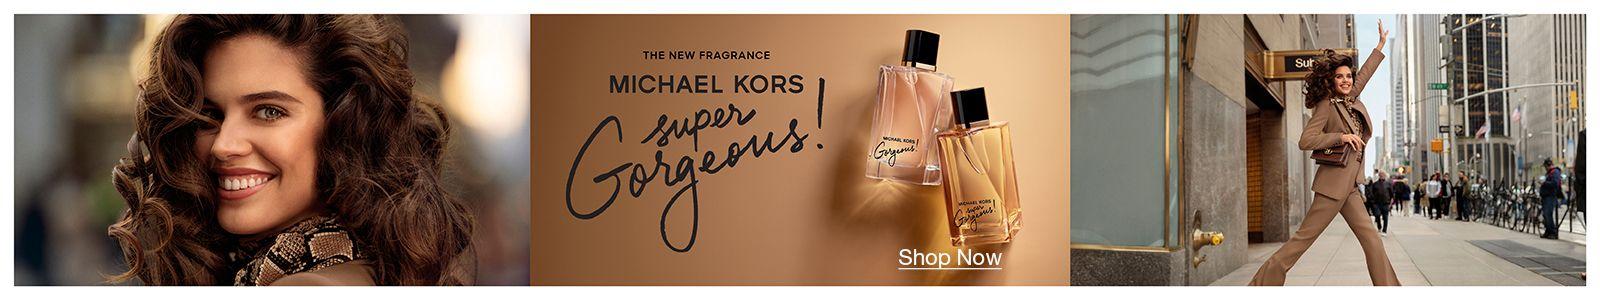 The new fragrance, Michael Kors, Super Gorgeous!